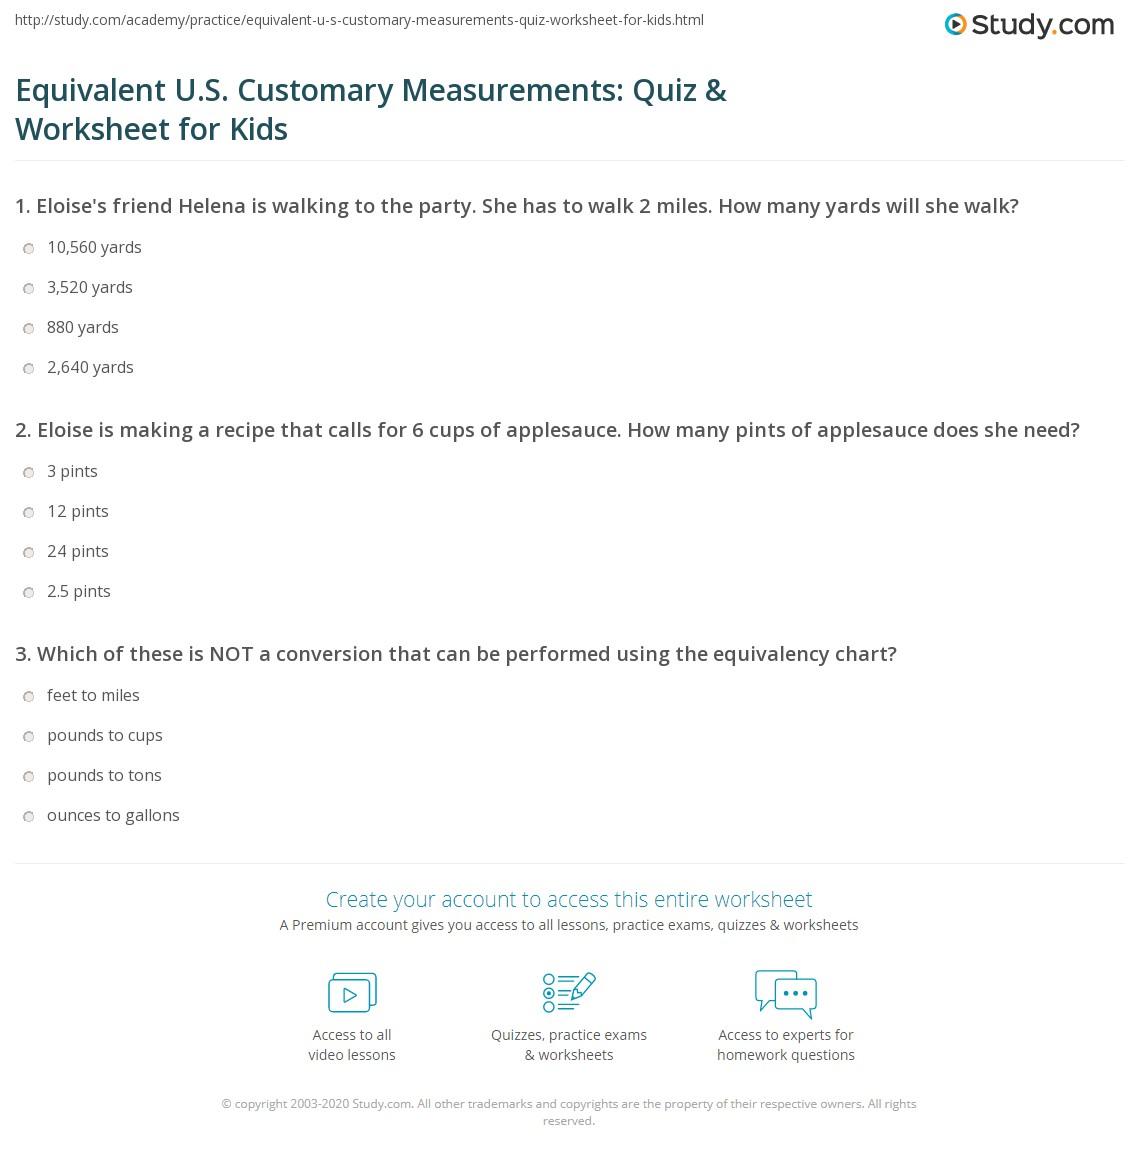 hight resolution of Equivalent U.S. Customary Measurements: Quiz \u0026 Worksheet for Kids    Study.com